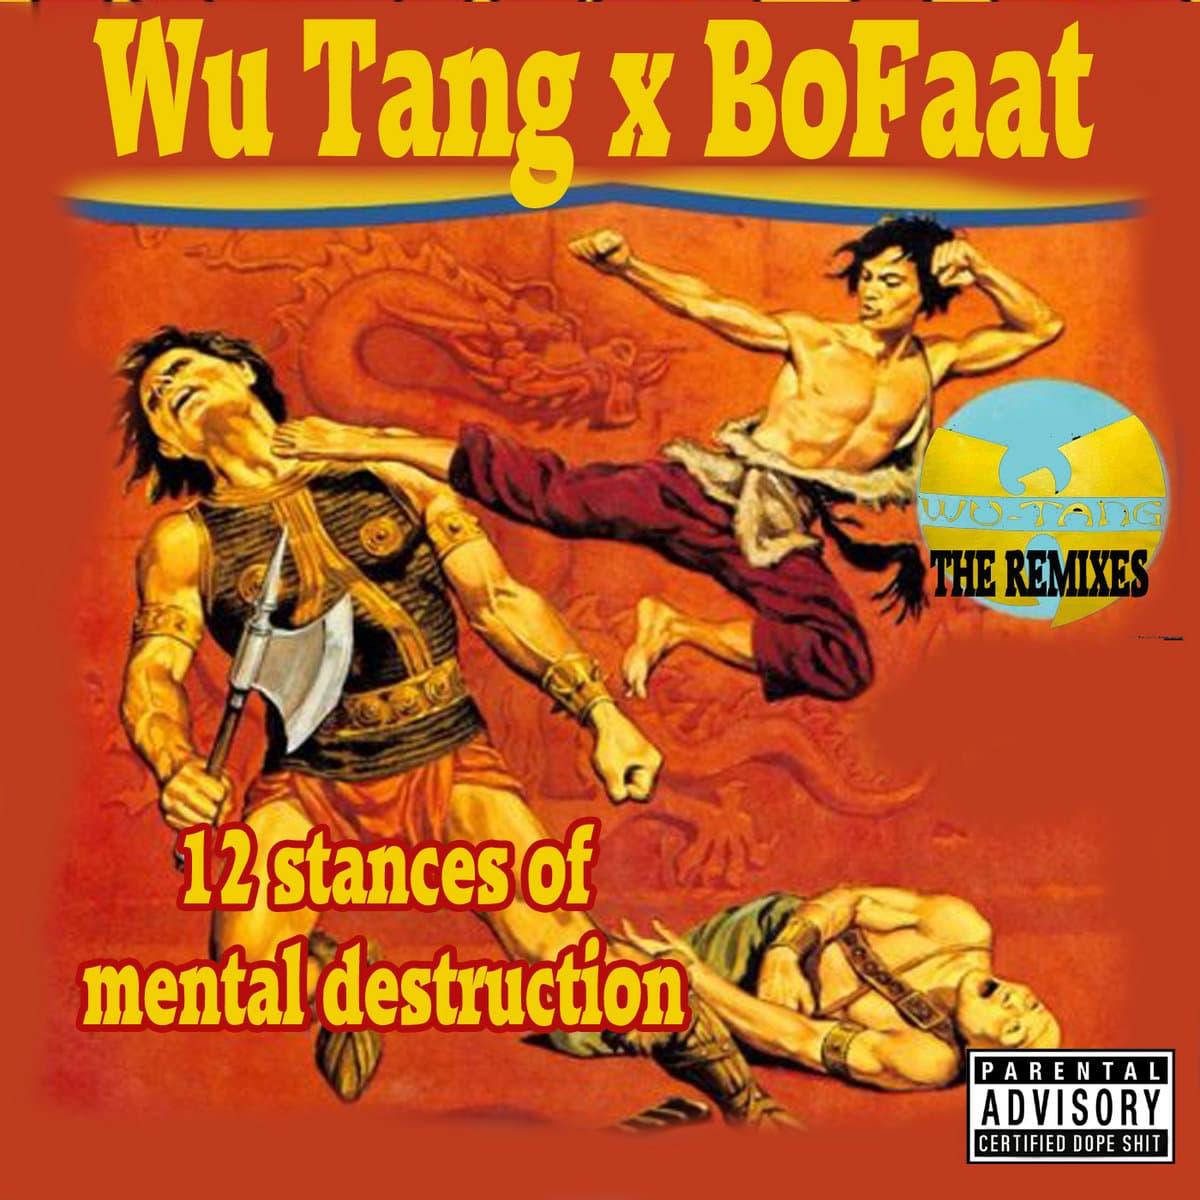 Wu Tang x BoFaat - Twelve Stances Of Mental Destruction | Remix Tape vom Producer BoFaatBeatz